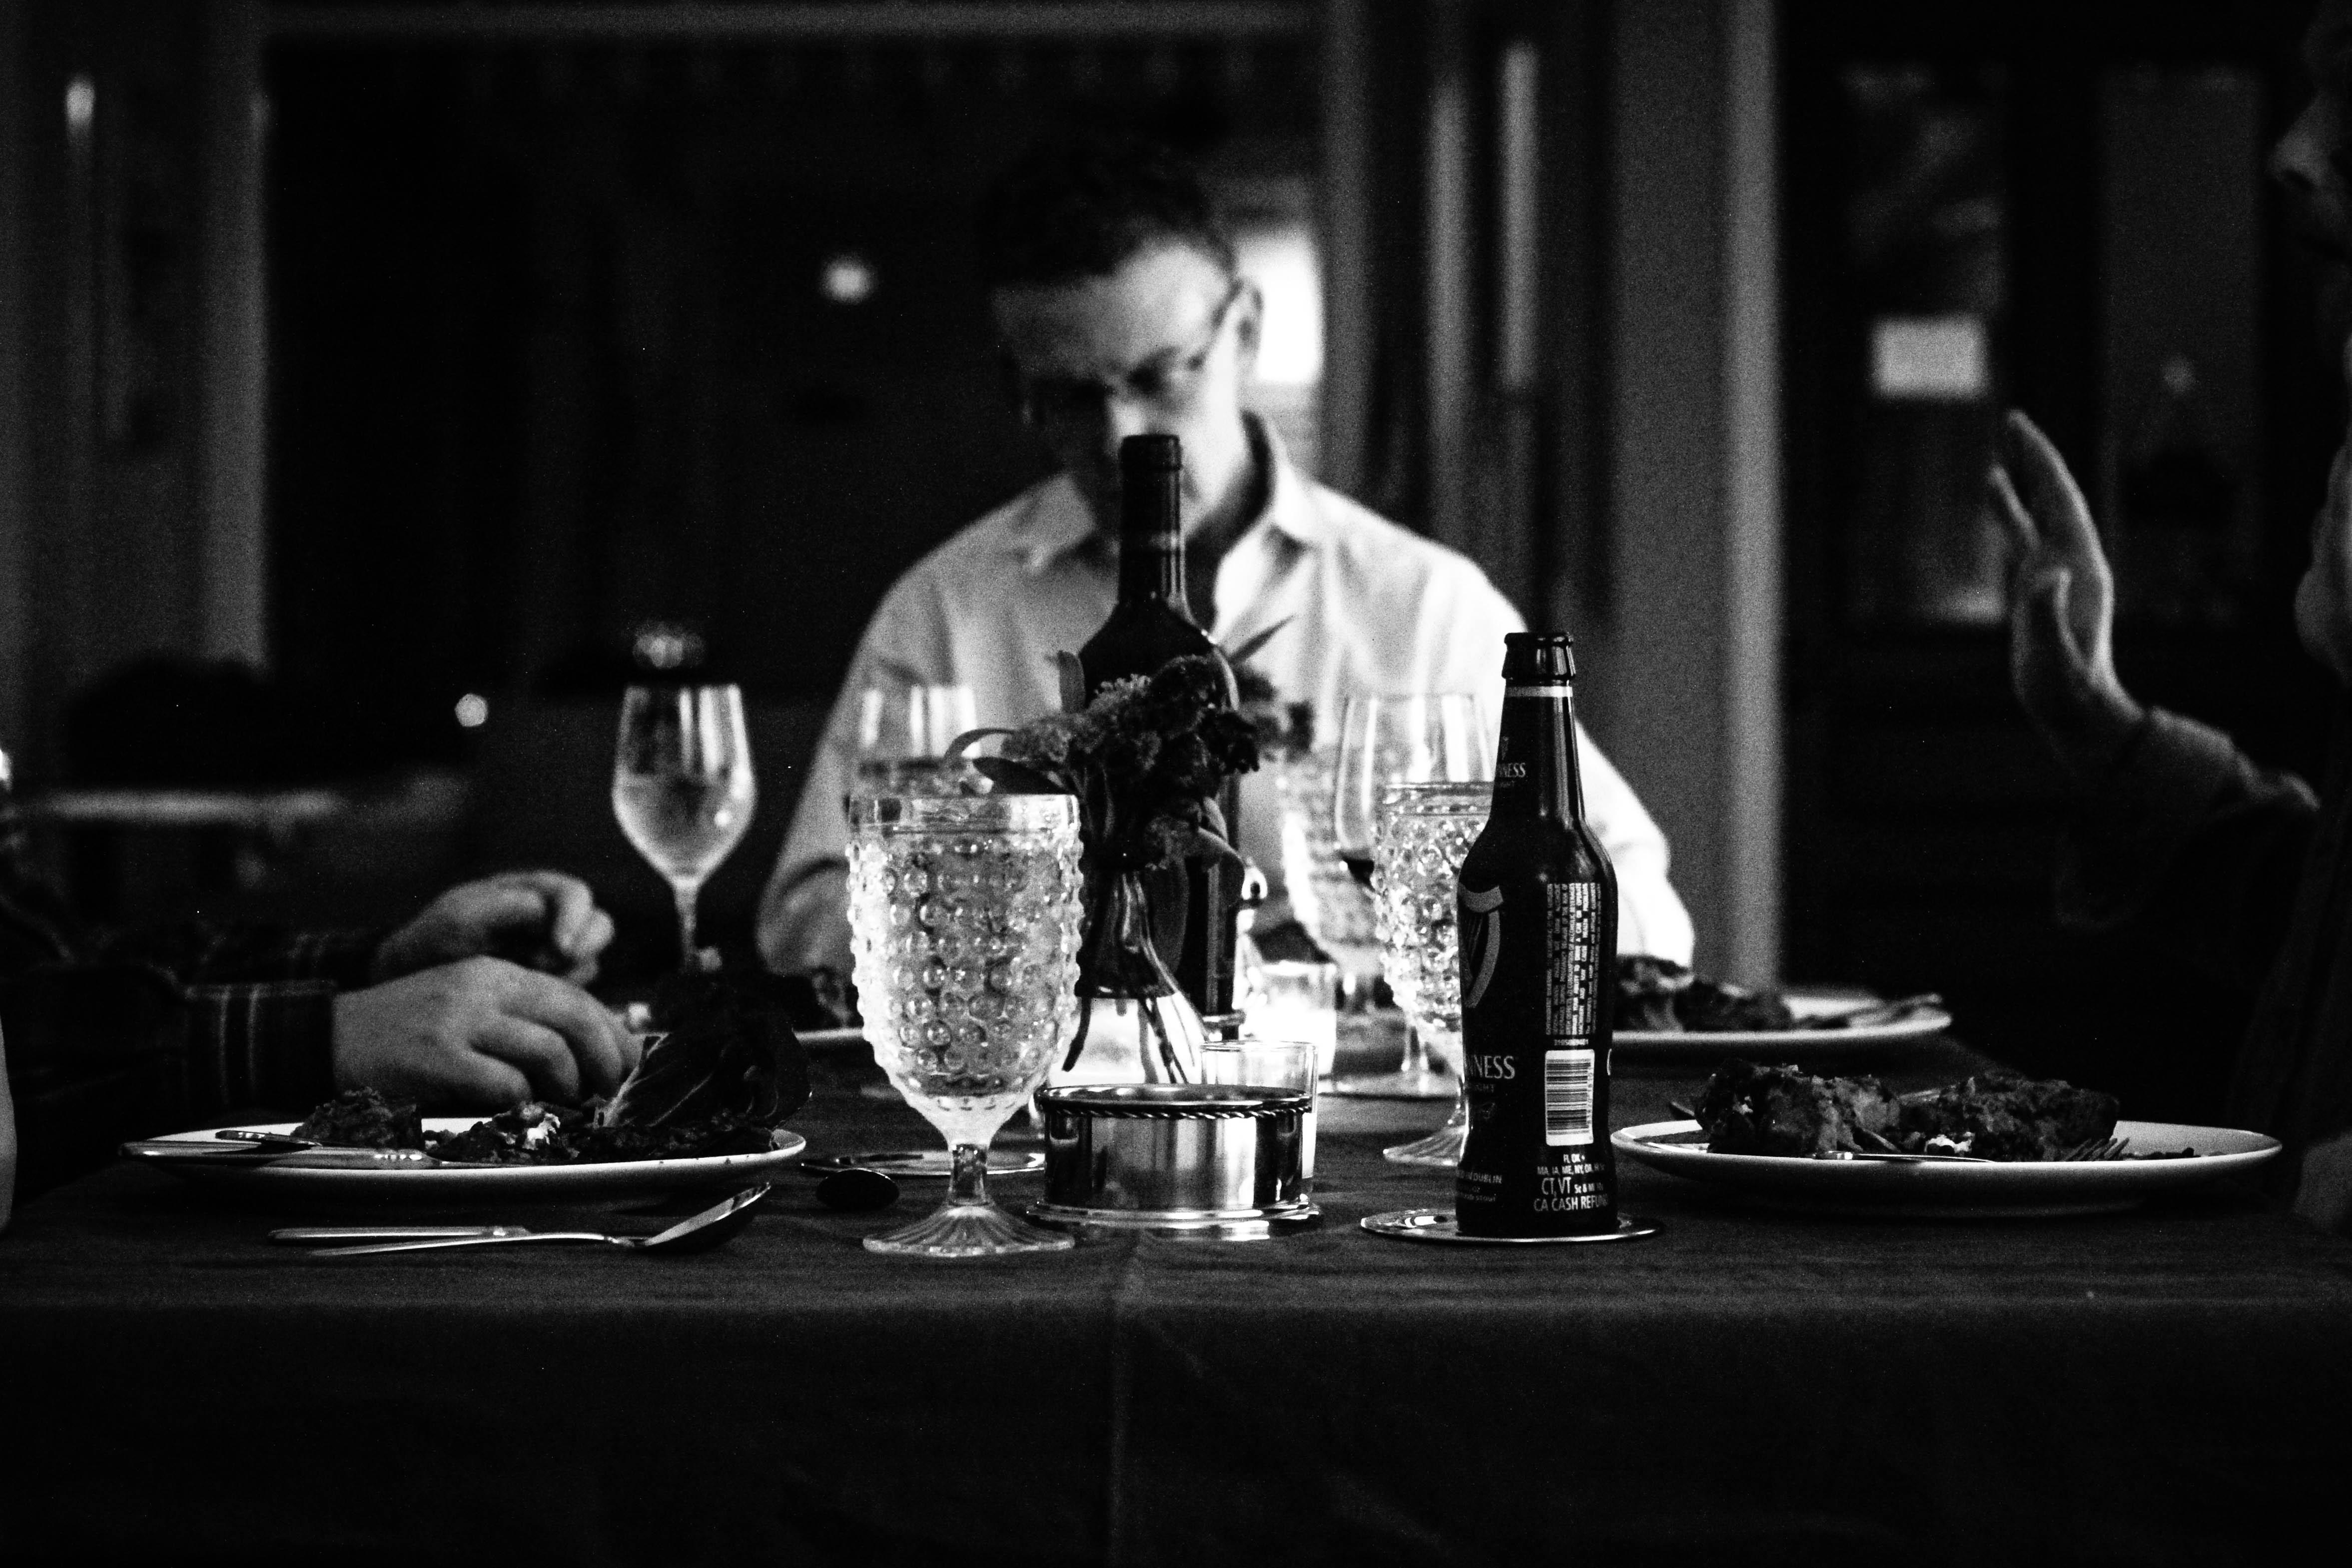 food photography, restaurant photography, cafe photography, professional photos, photography, restaurant, vero beach photographer, indian river photography, florida photography,